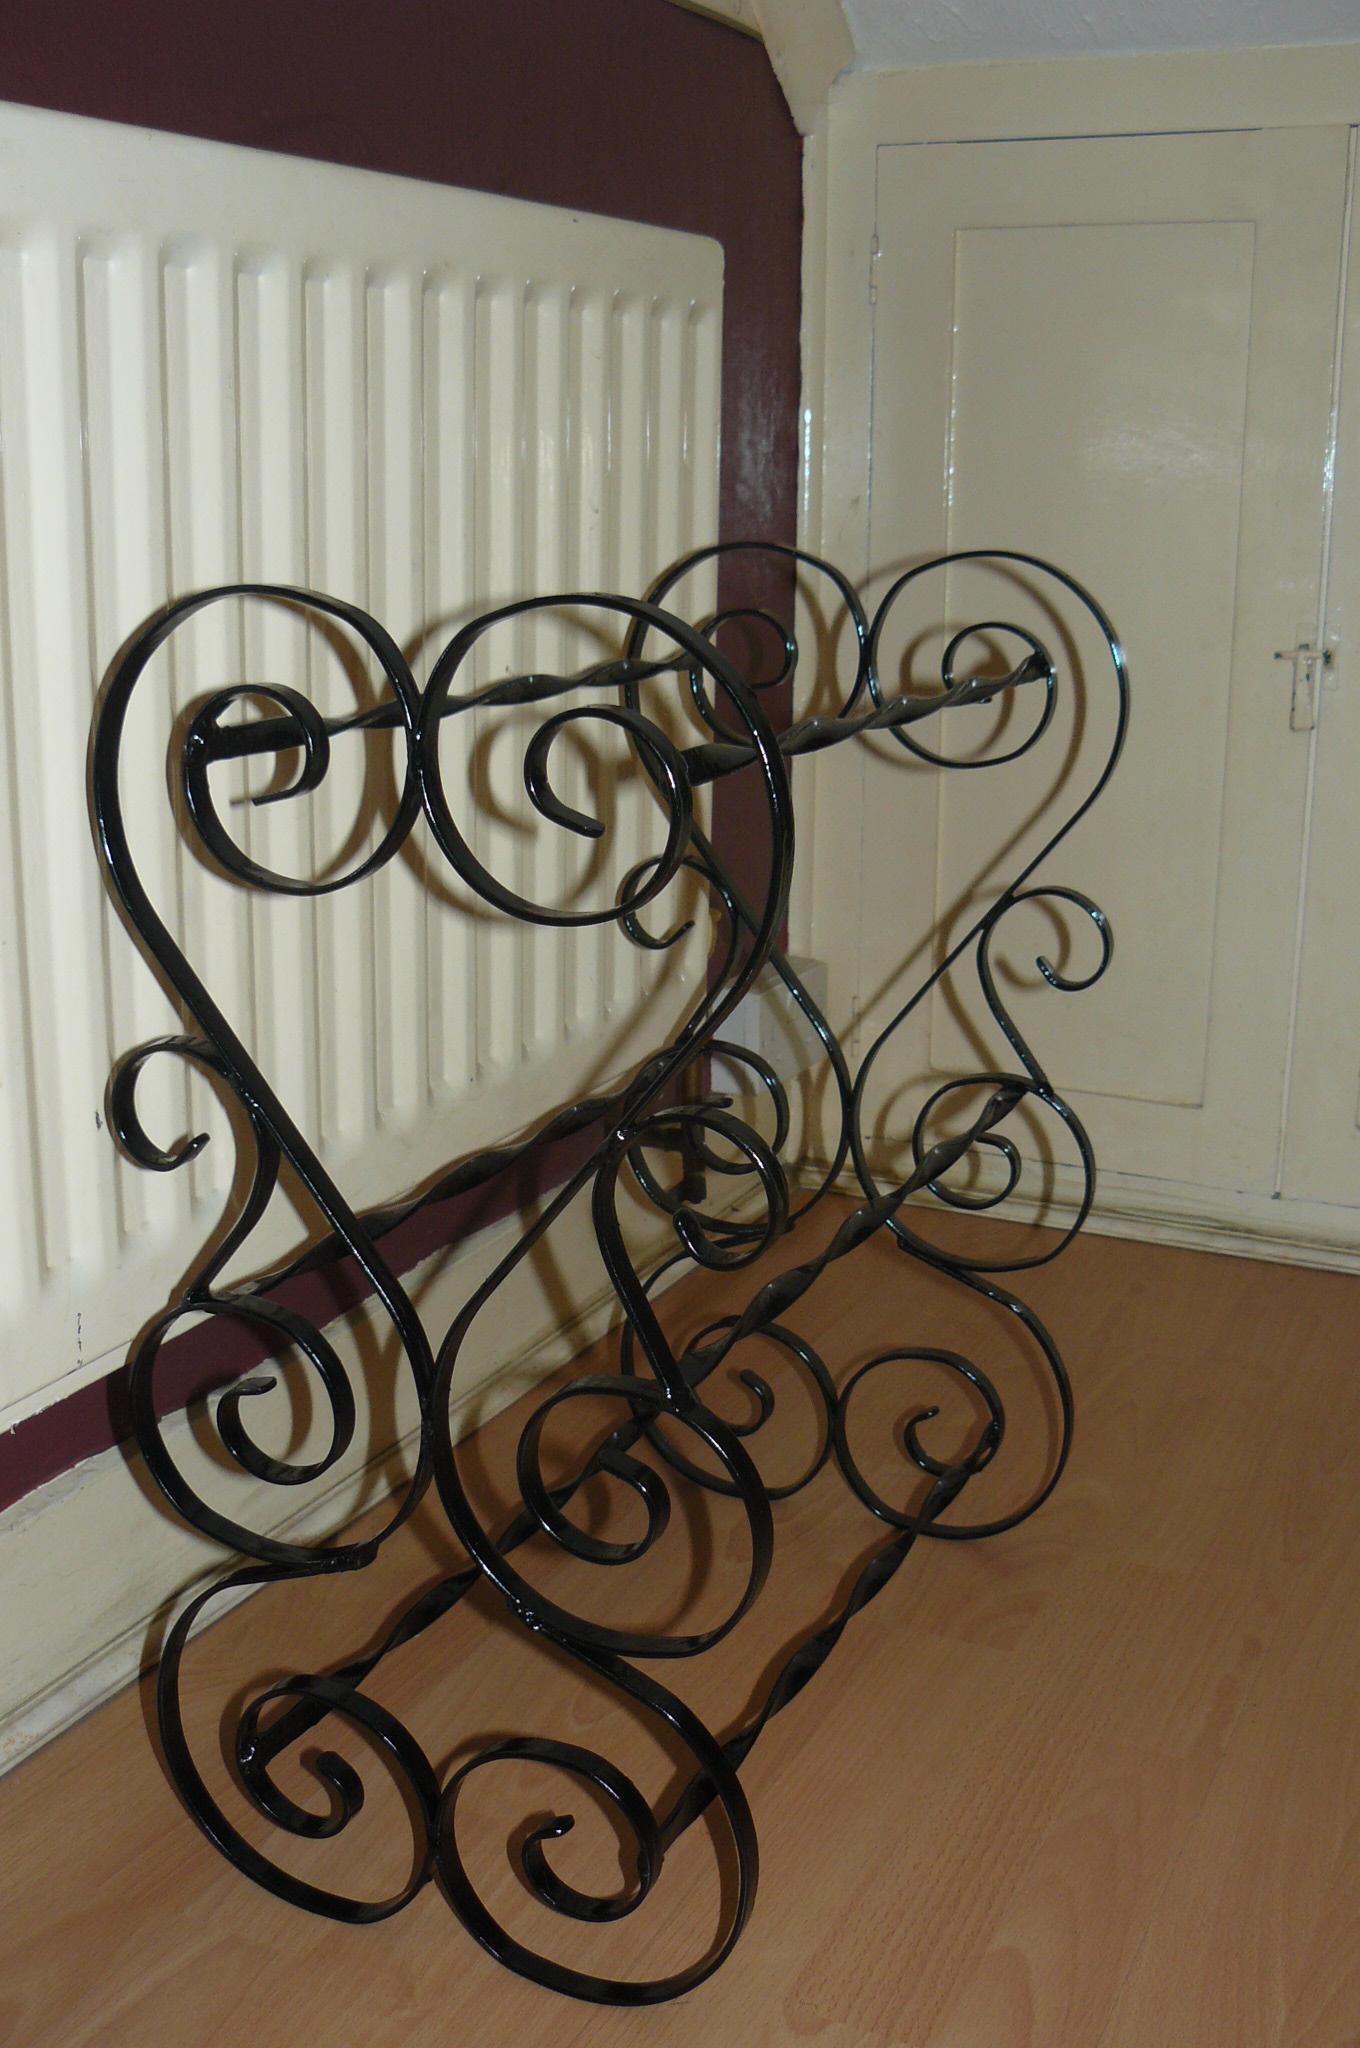 scrolled shoe rack 6 pair wimborne wrought iron works